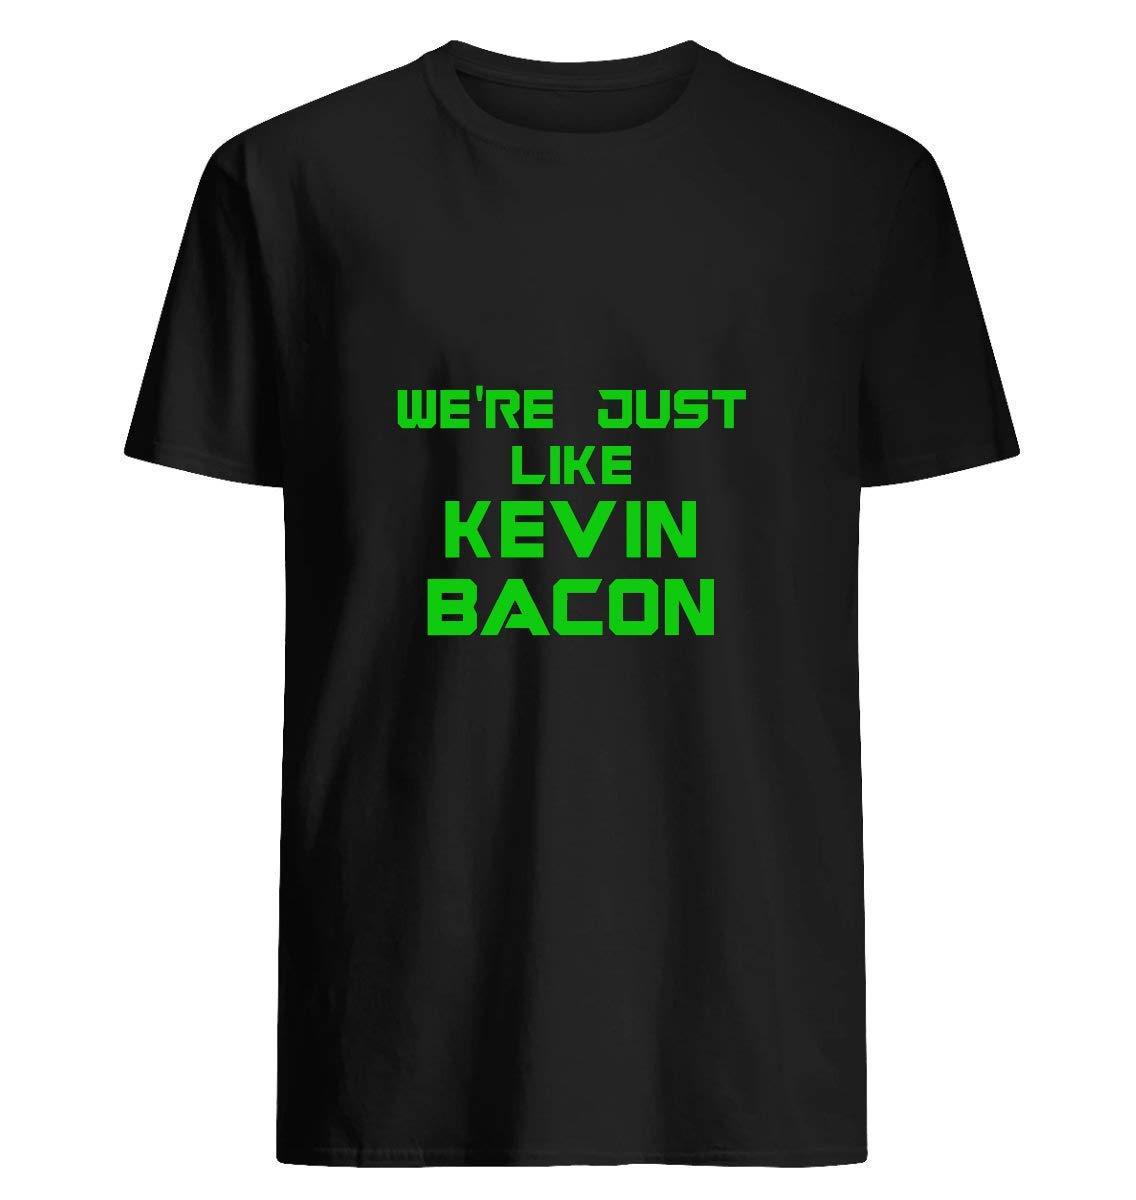 Bacon T Shirt 53 T Shirt For Unisex